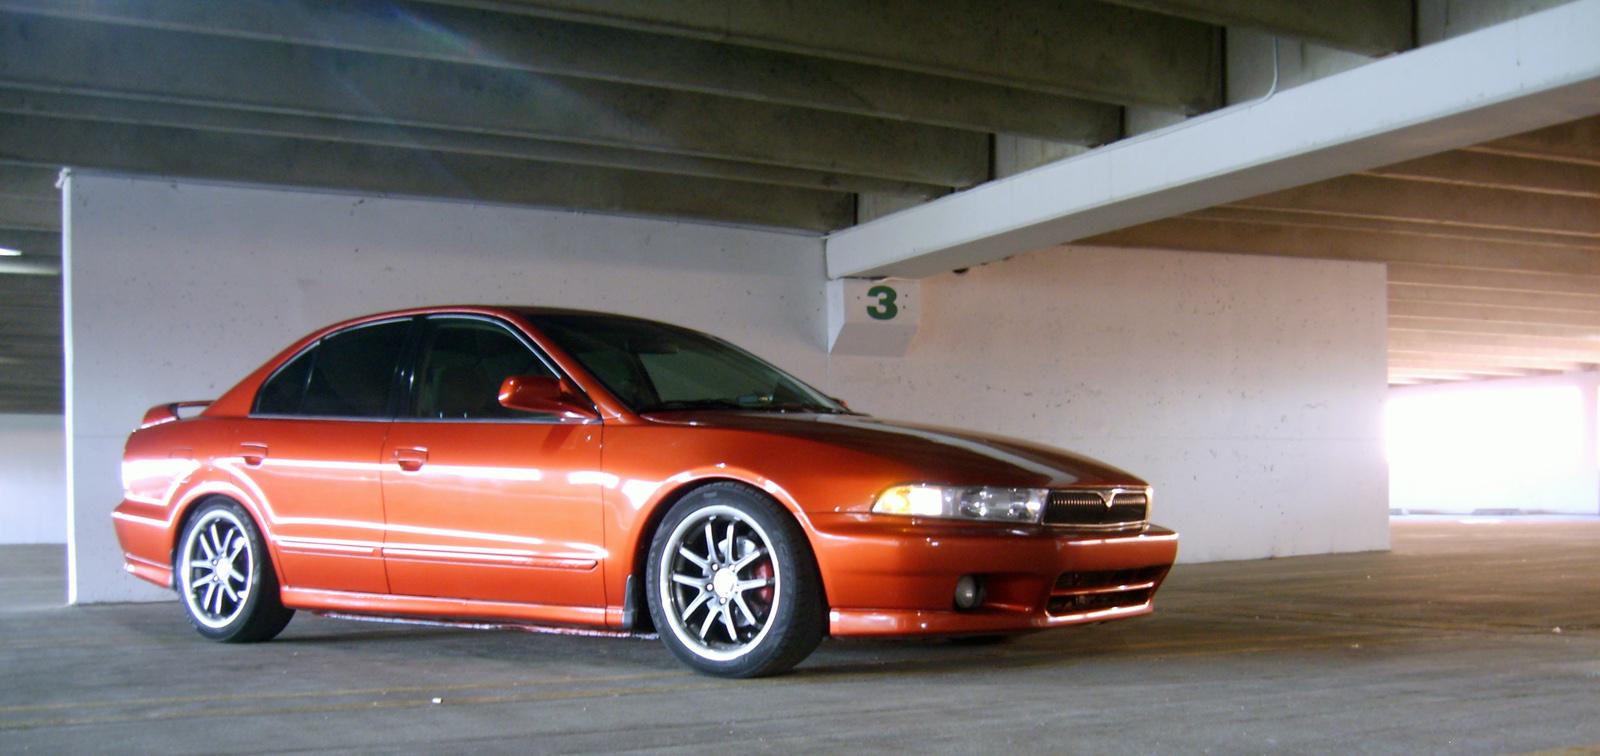 2001 Mitsubishi Galant Es V6 Pictures 2001 Mitsubishi Galant Es V4